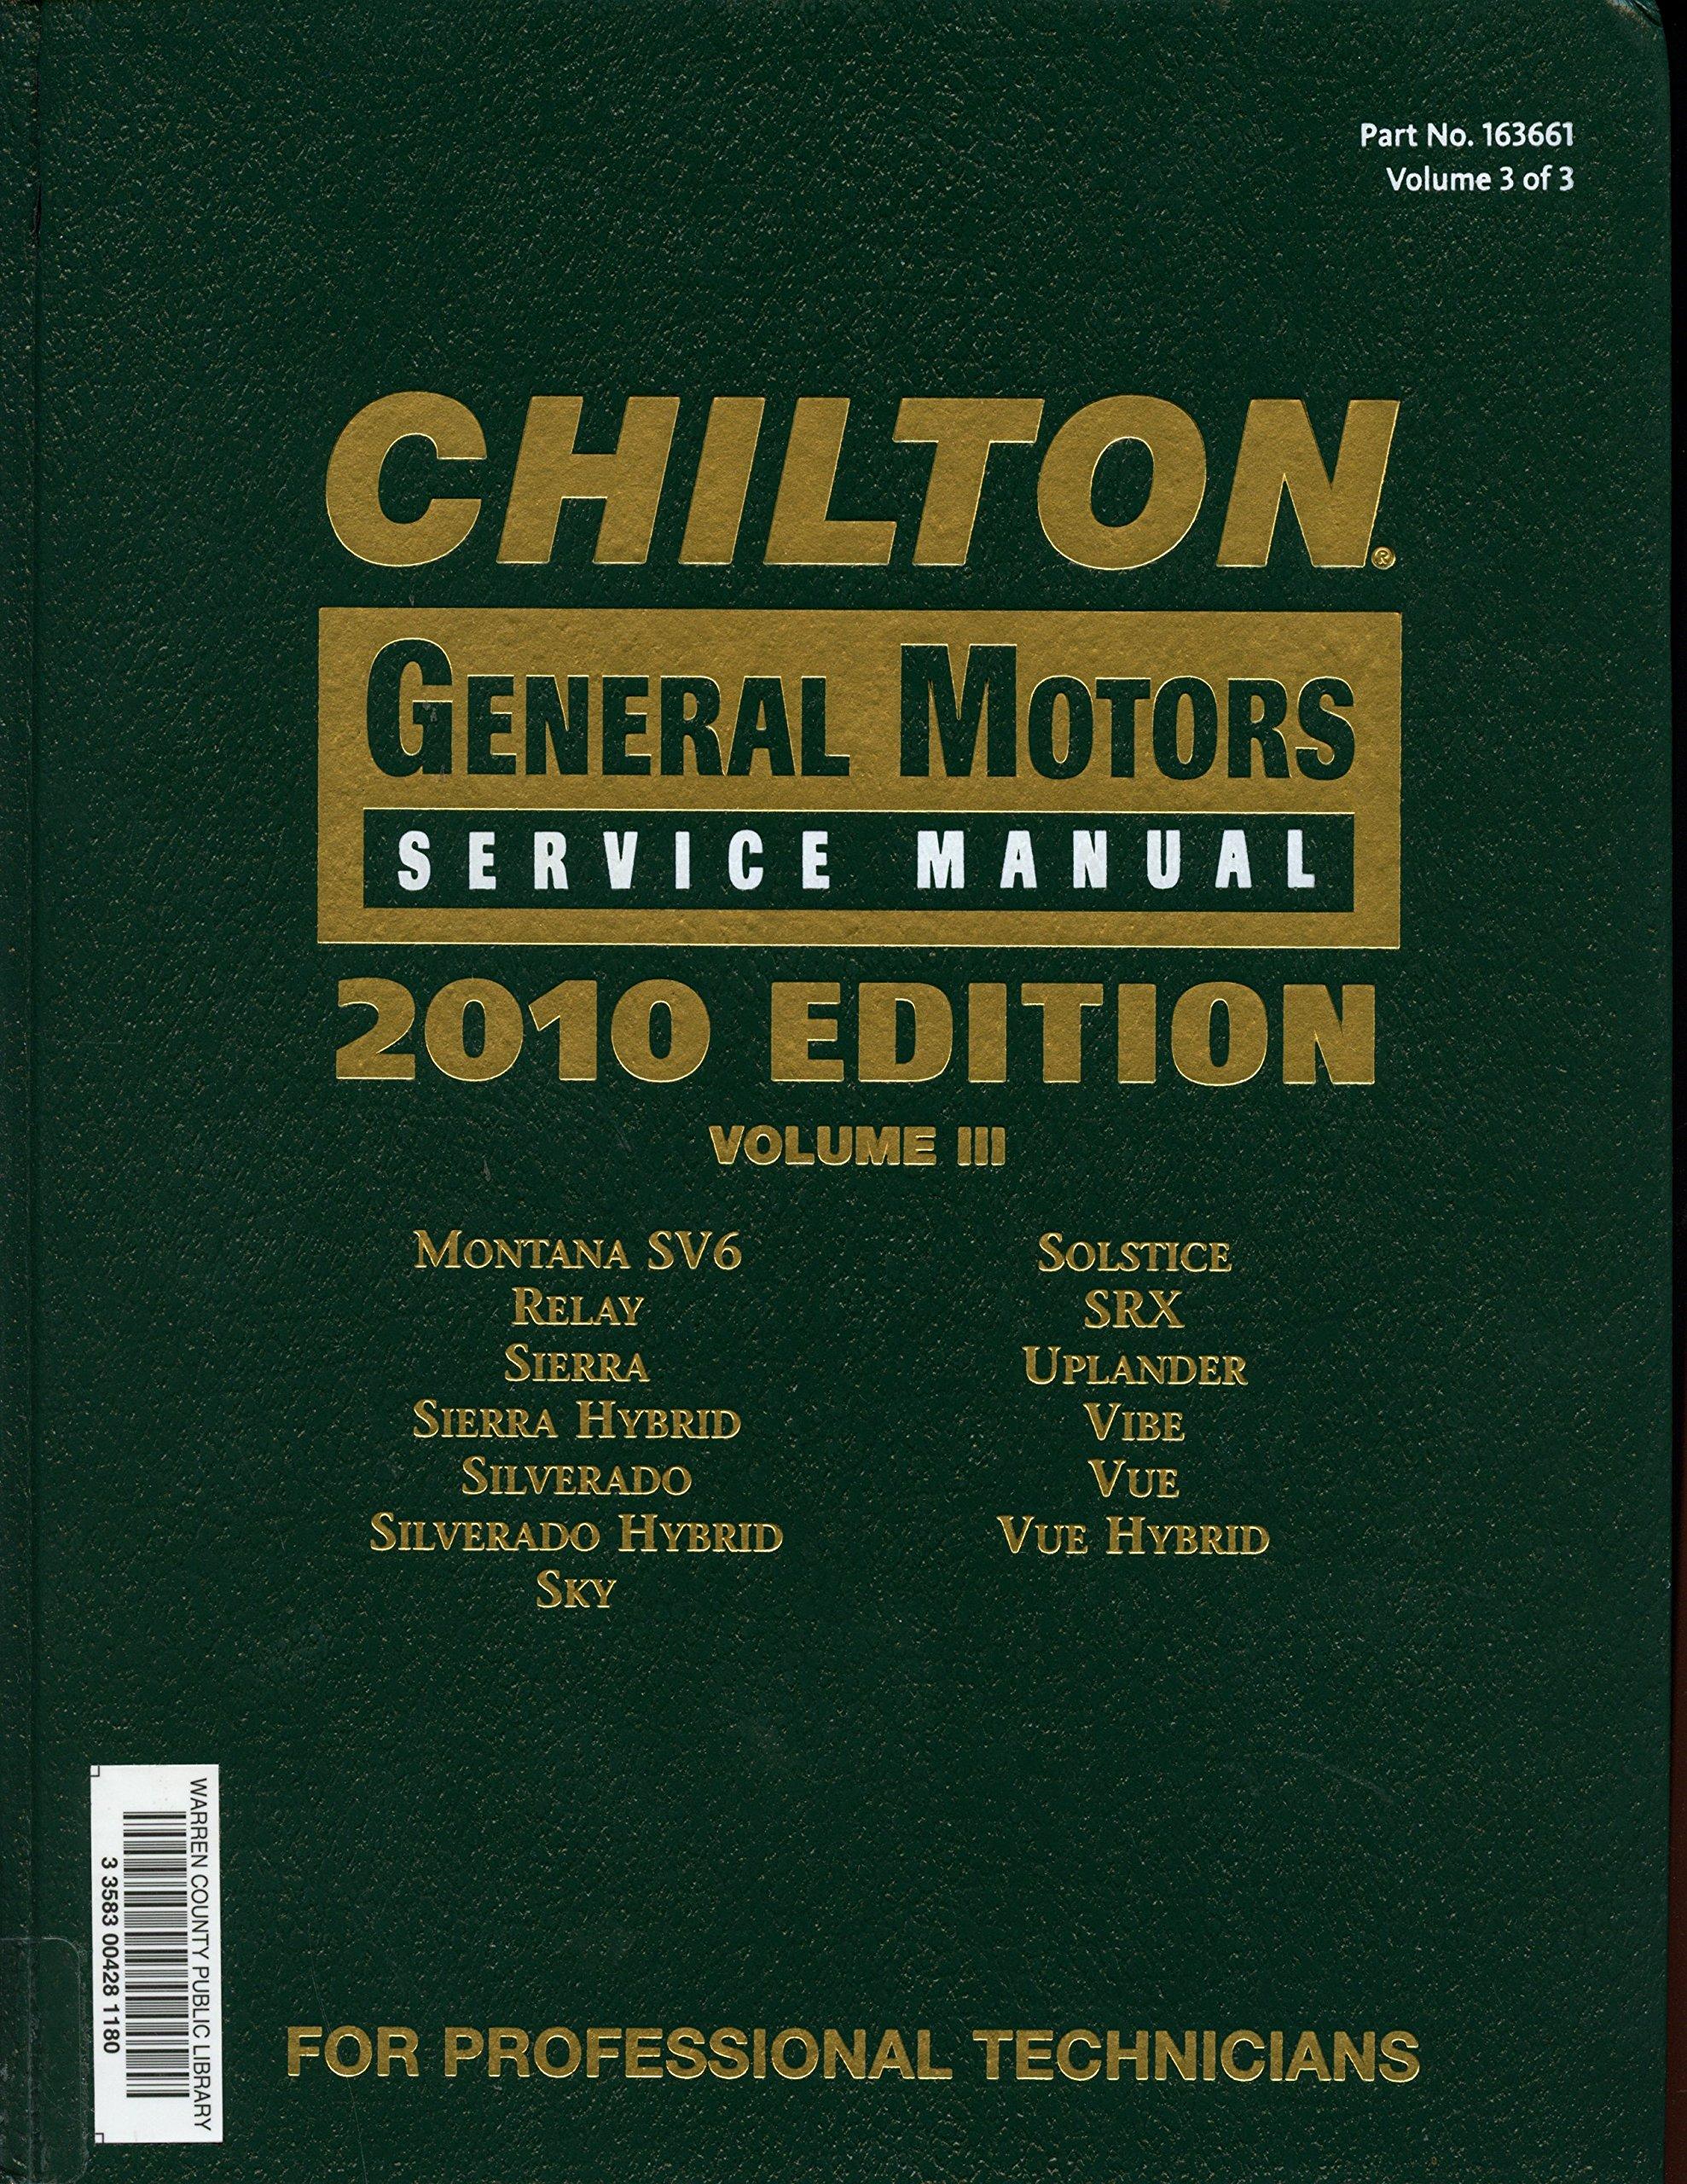 Chilton General Motors Service Manual, Vol. 3 by Various (2010-05-03):  Various: 9781111036607: Amazon.com: Books